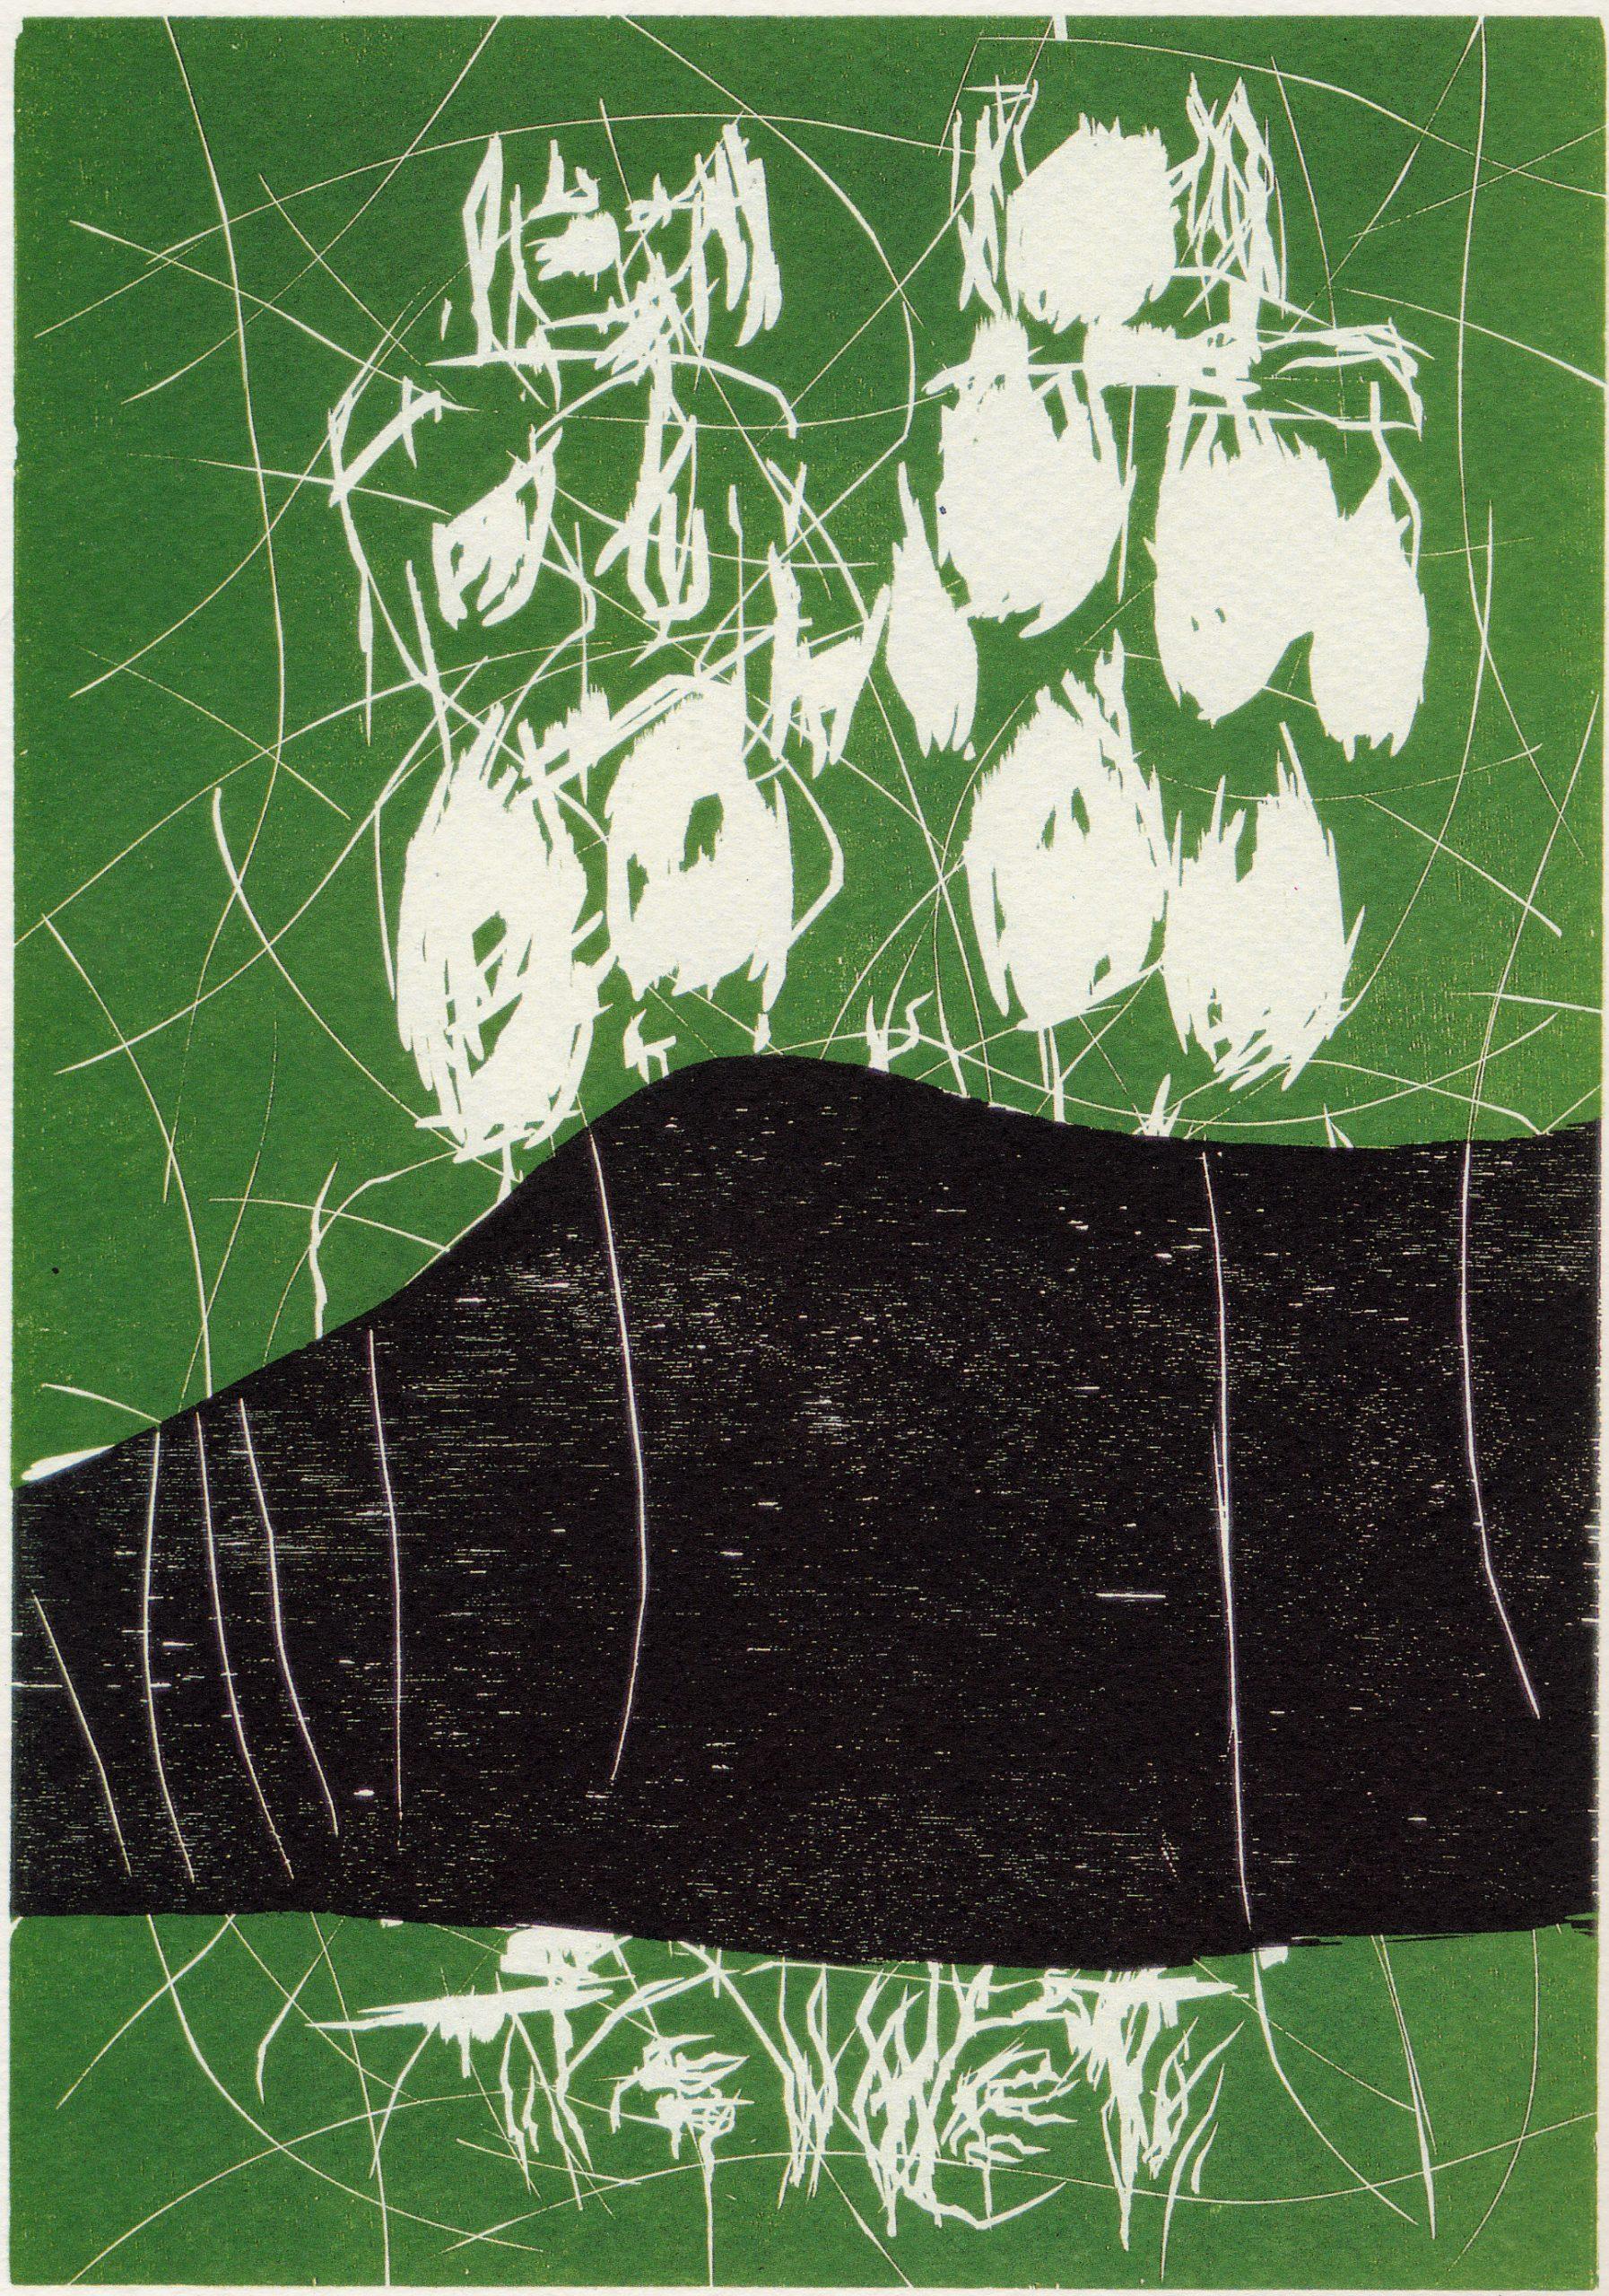 Der Berg (Mountain) by Georg Baselitz